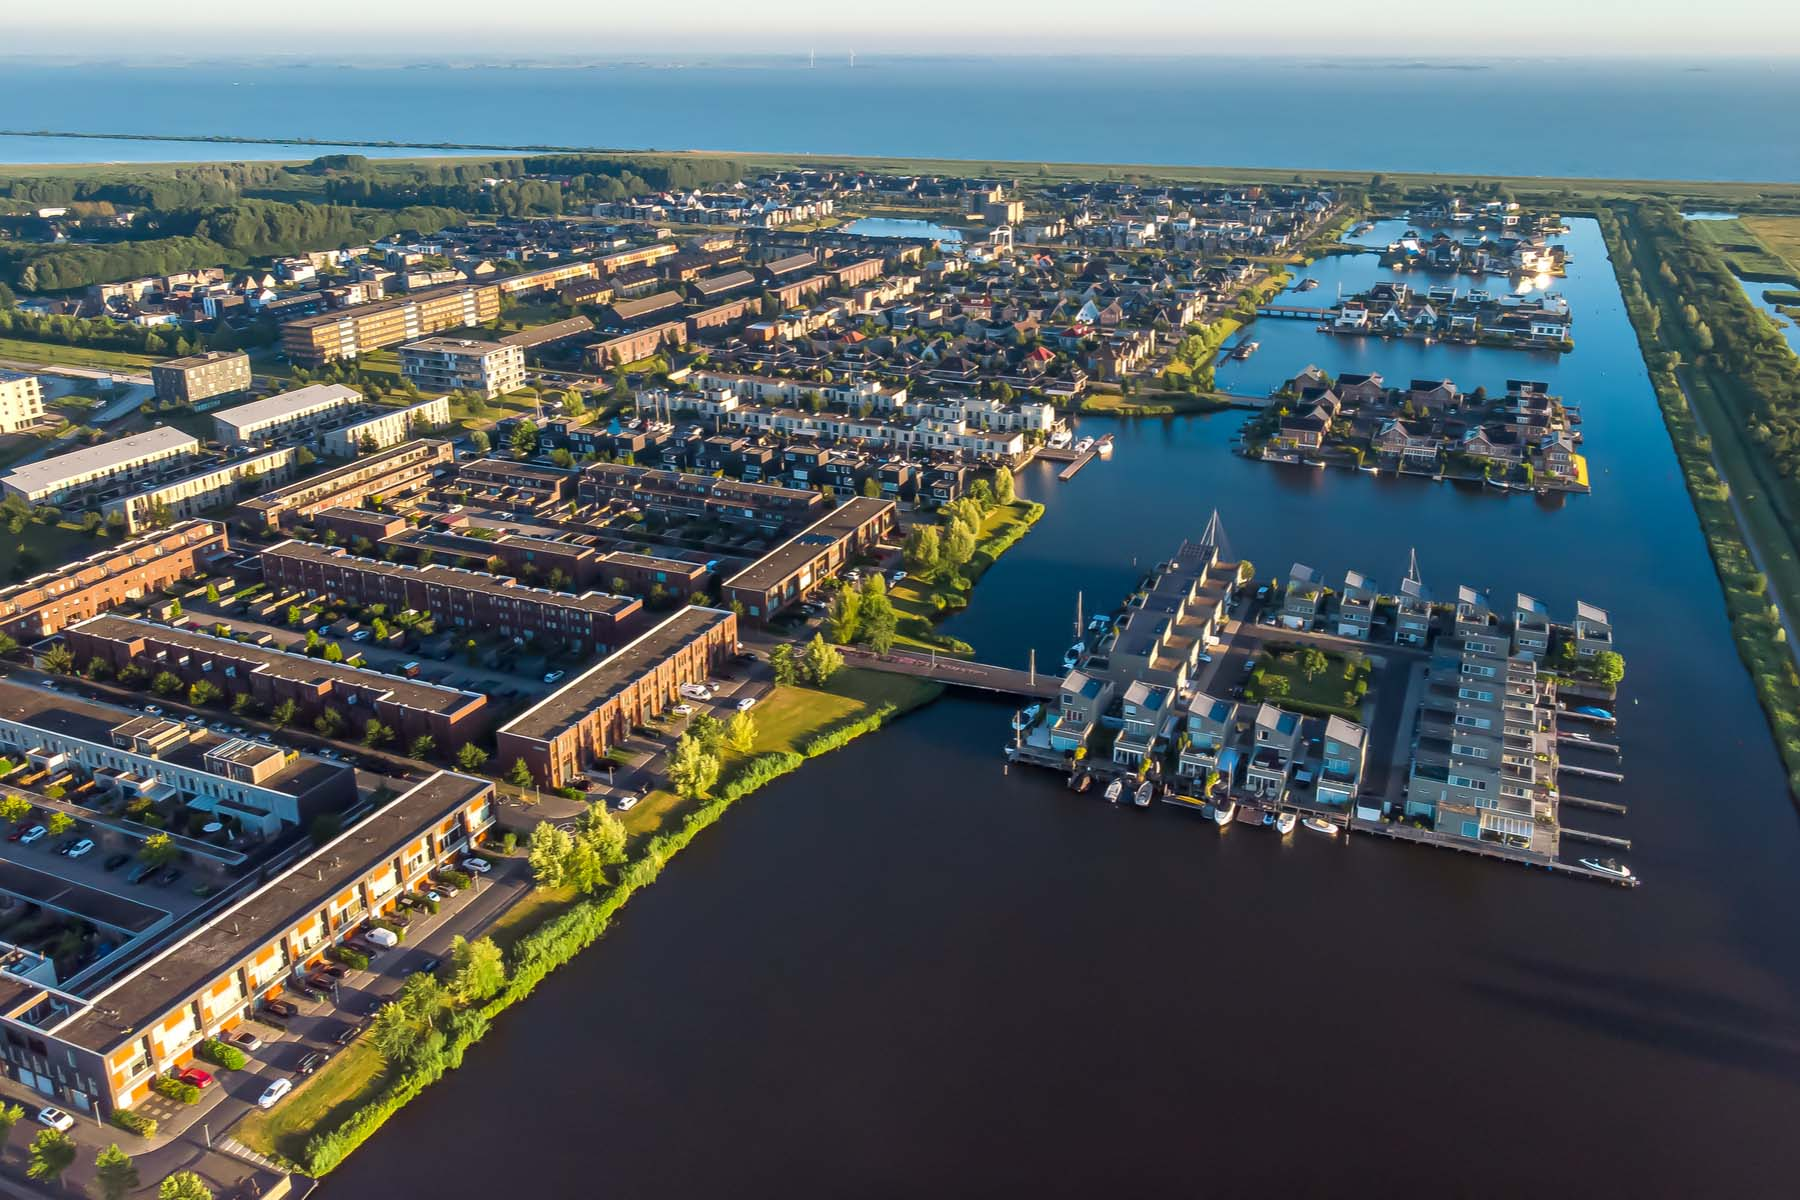 Cities close to Amsterdam: Almere